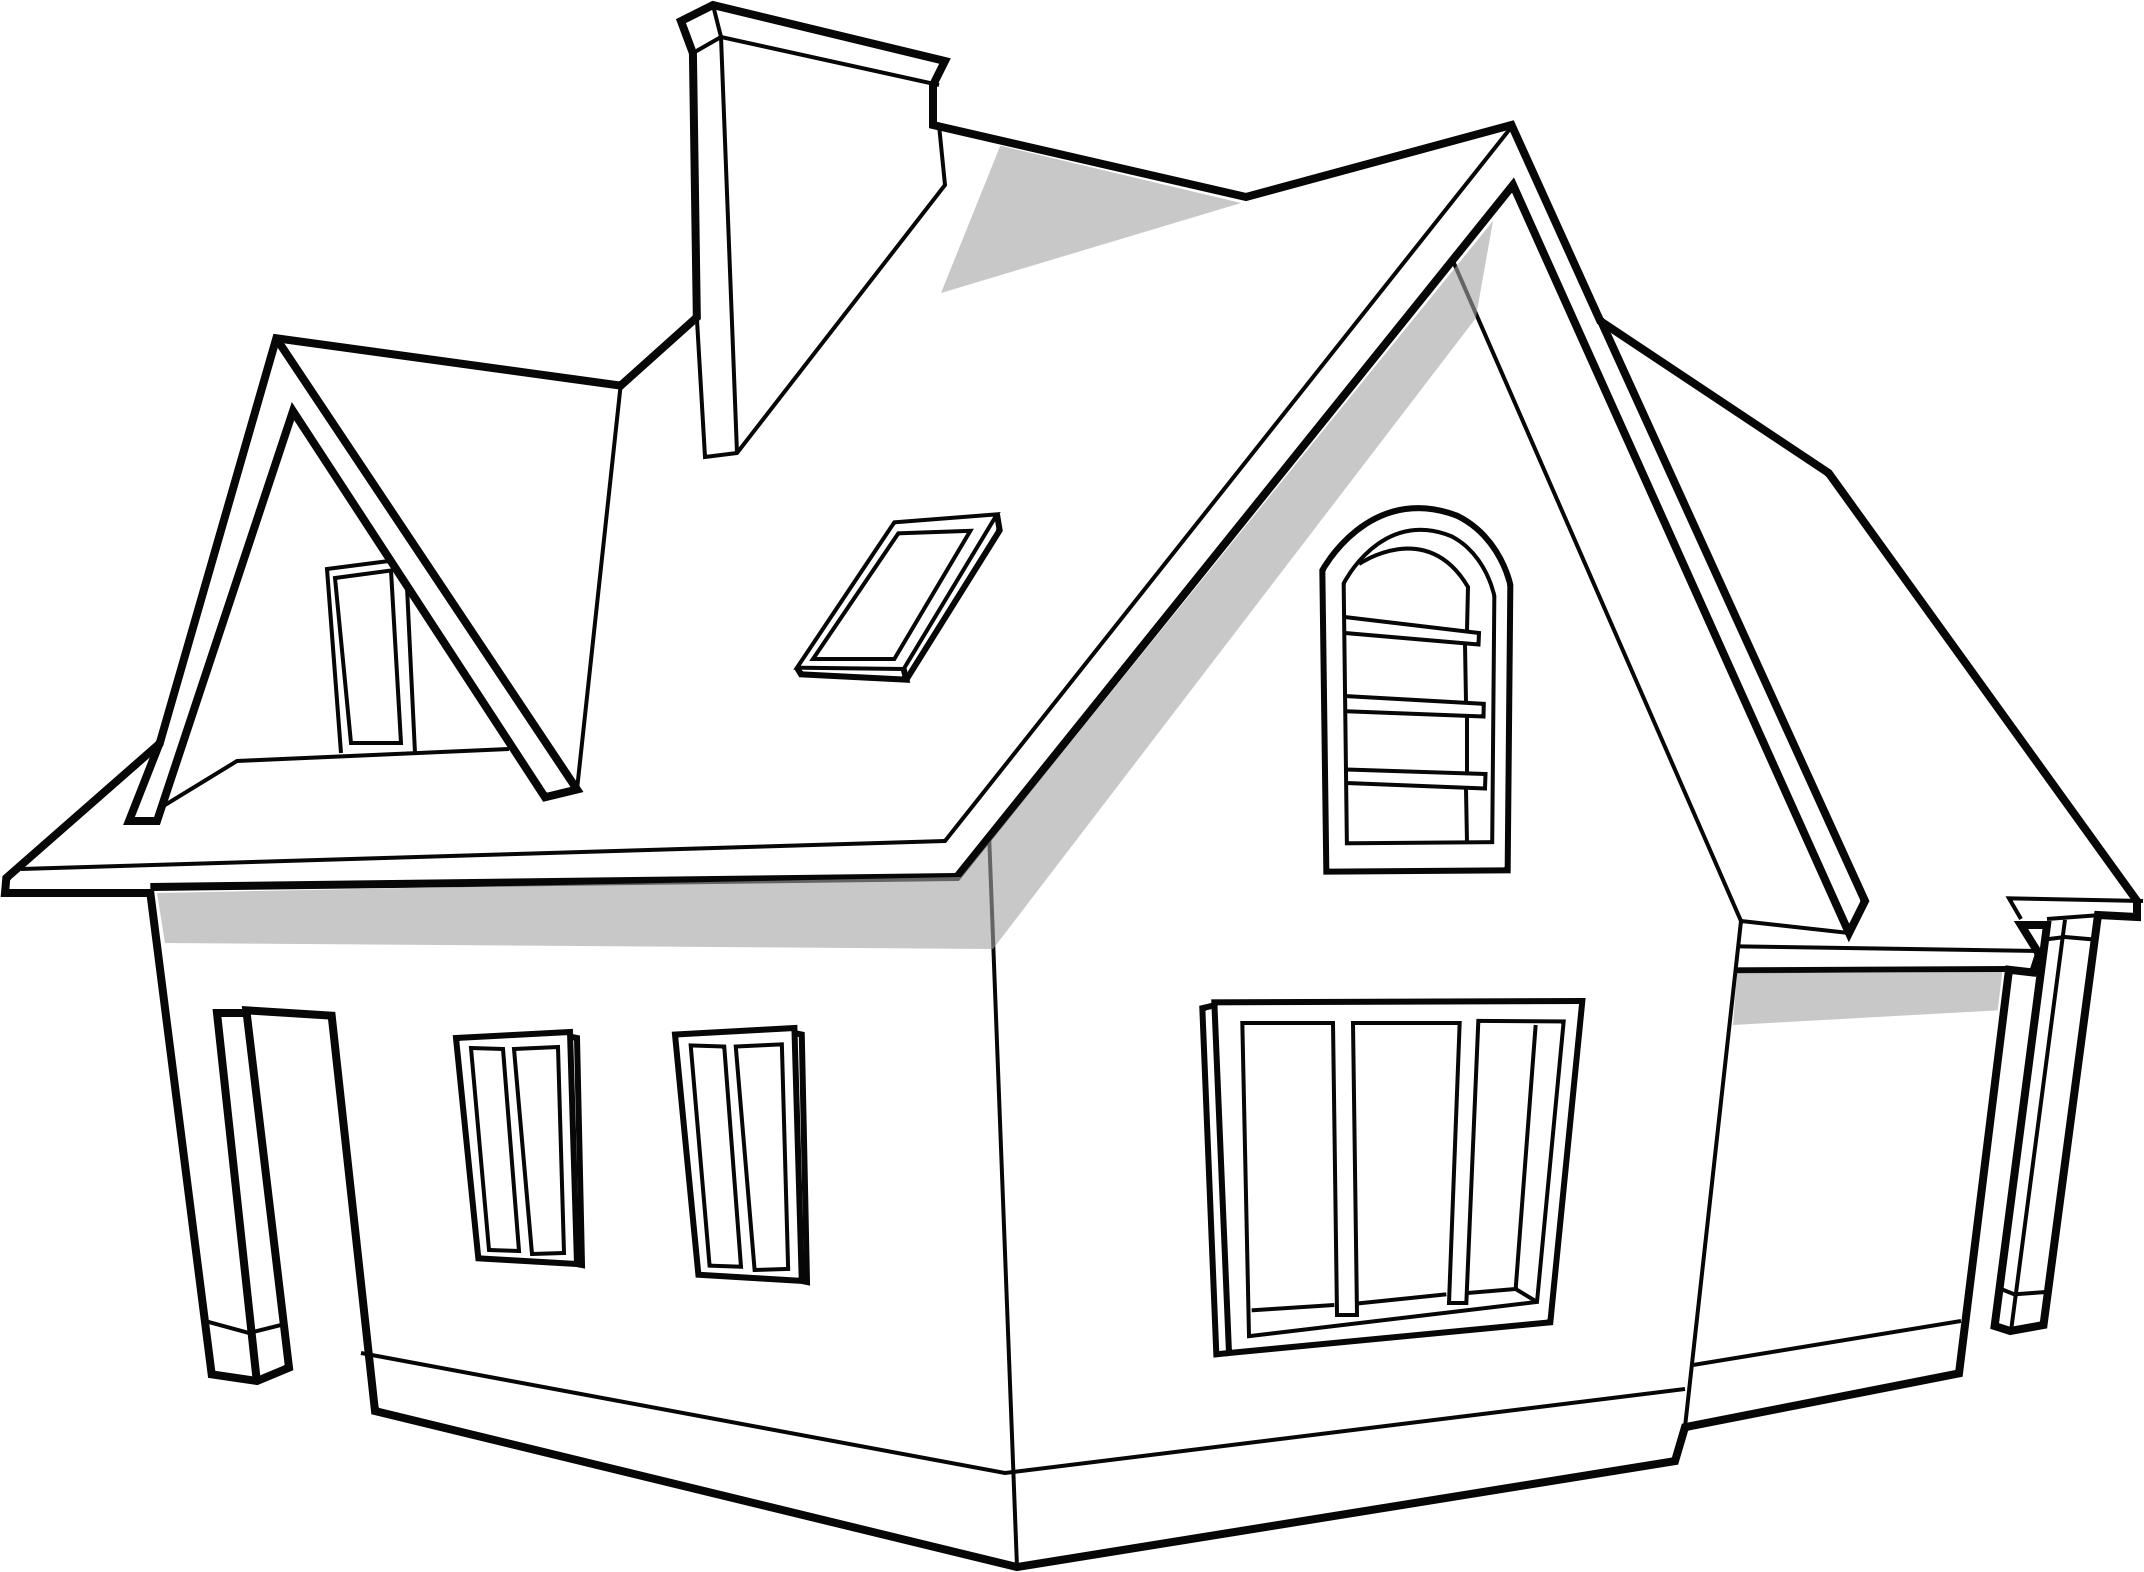 Modern house svg image for Videoscribe by scribblesvg